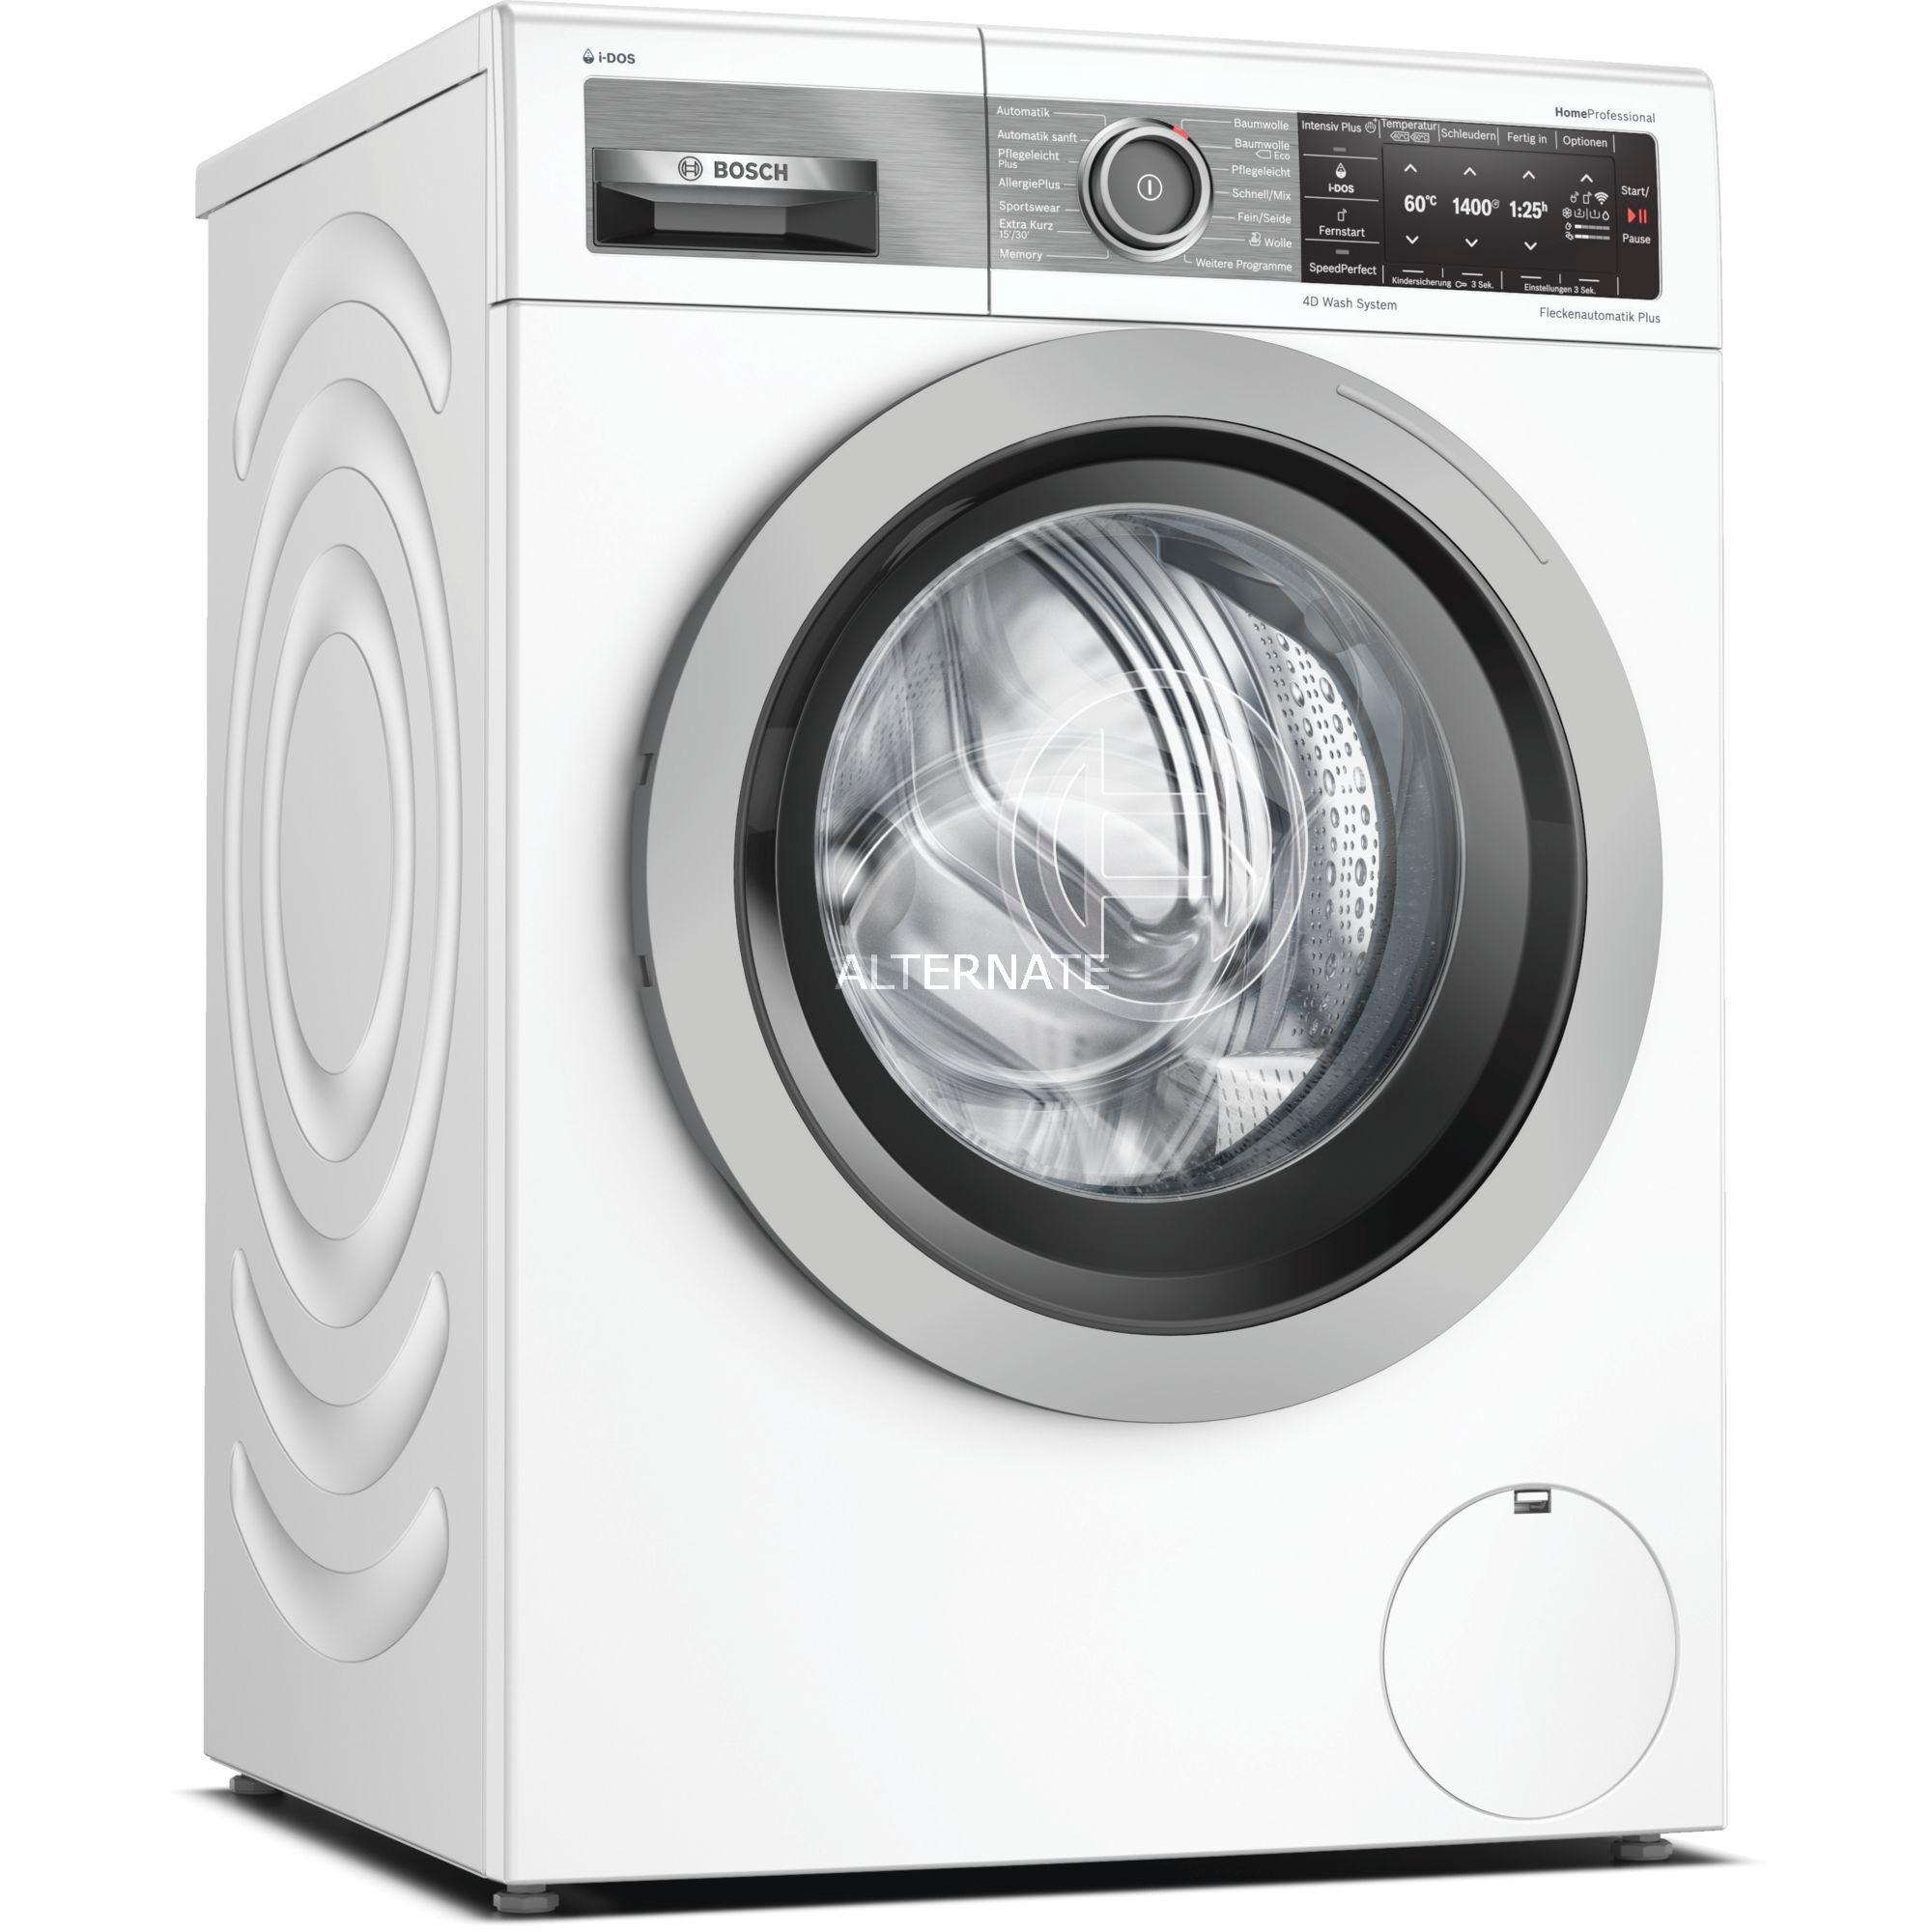 WAV28E41 HomeProfessional, Waschmaschine (weiß, Home Connect, i DOS)